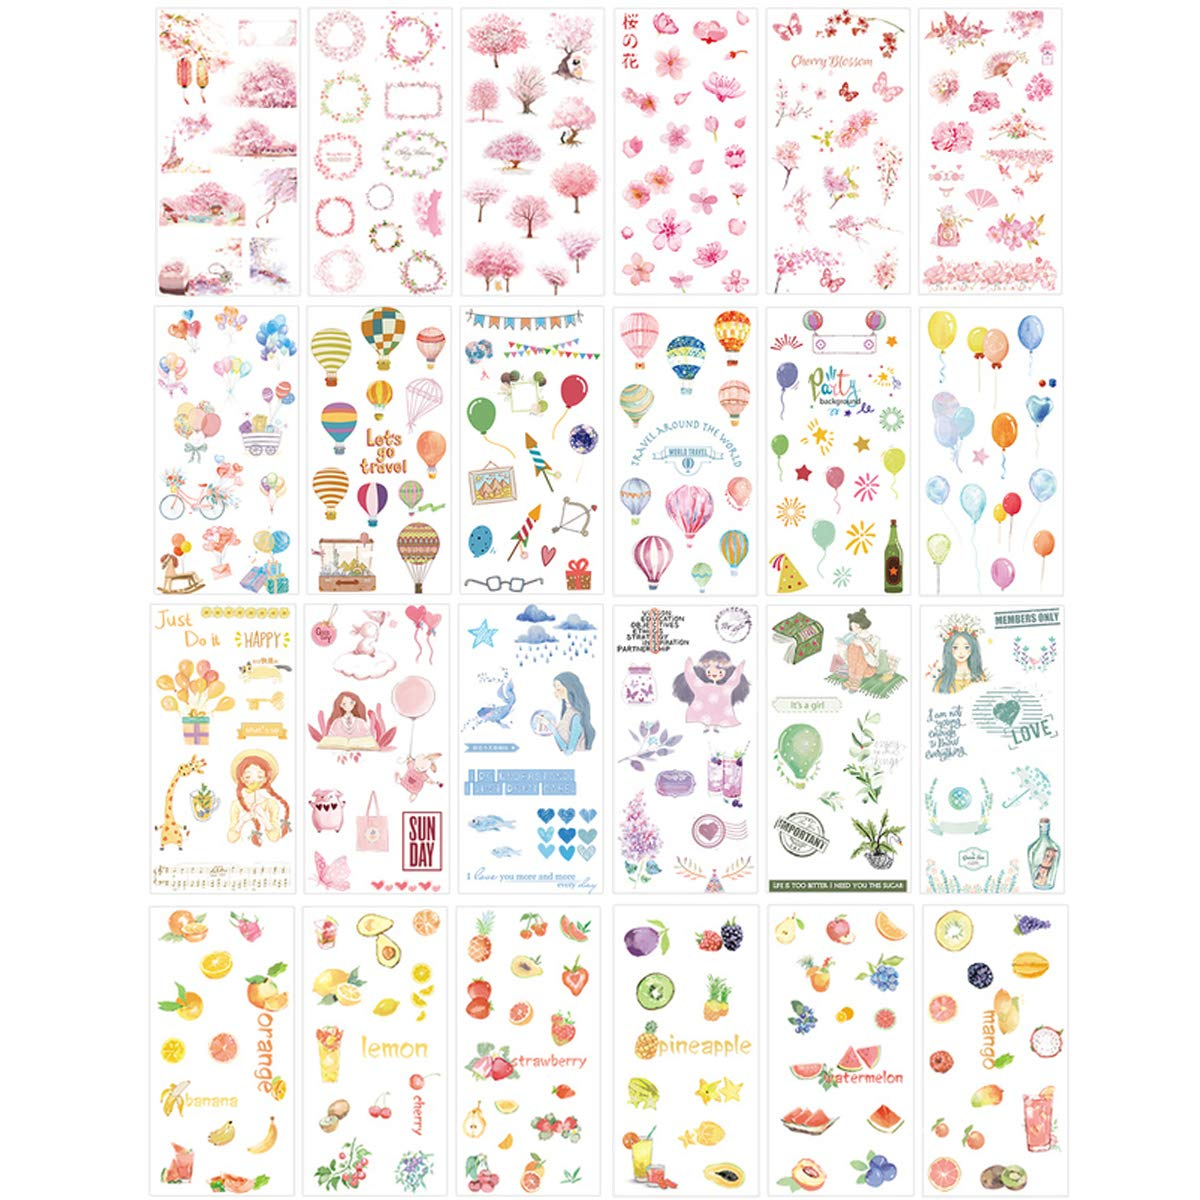 Cute Stationery Sticker Set (Assorted 24 Sheets) Flower Balloon Kawaii Girl Food Bottle Drink Snack Sticker Scrapbooking Travel Journal Diary Book Album Decorative Label Office Supplies